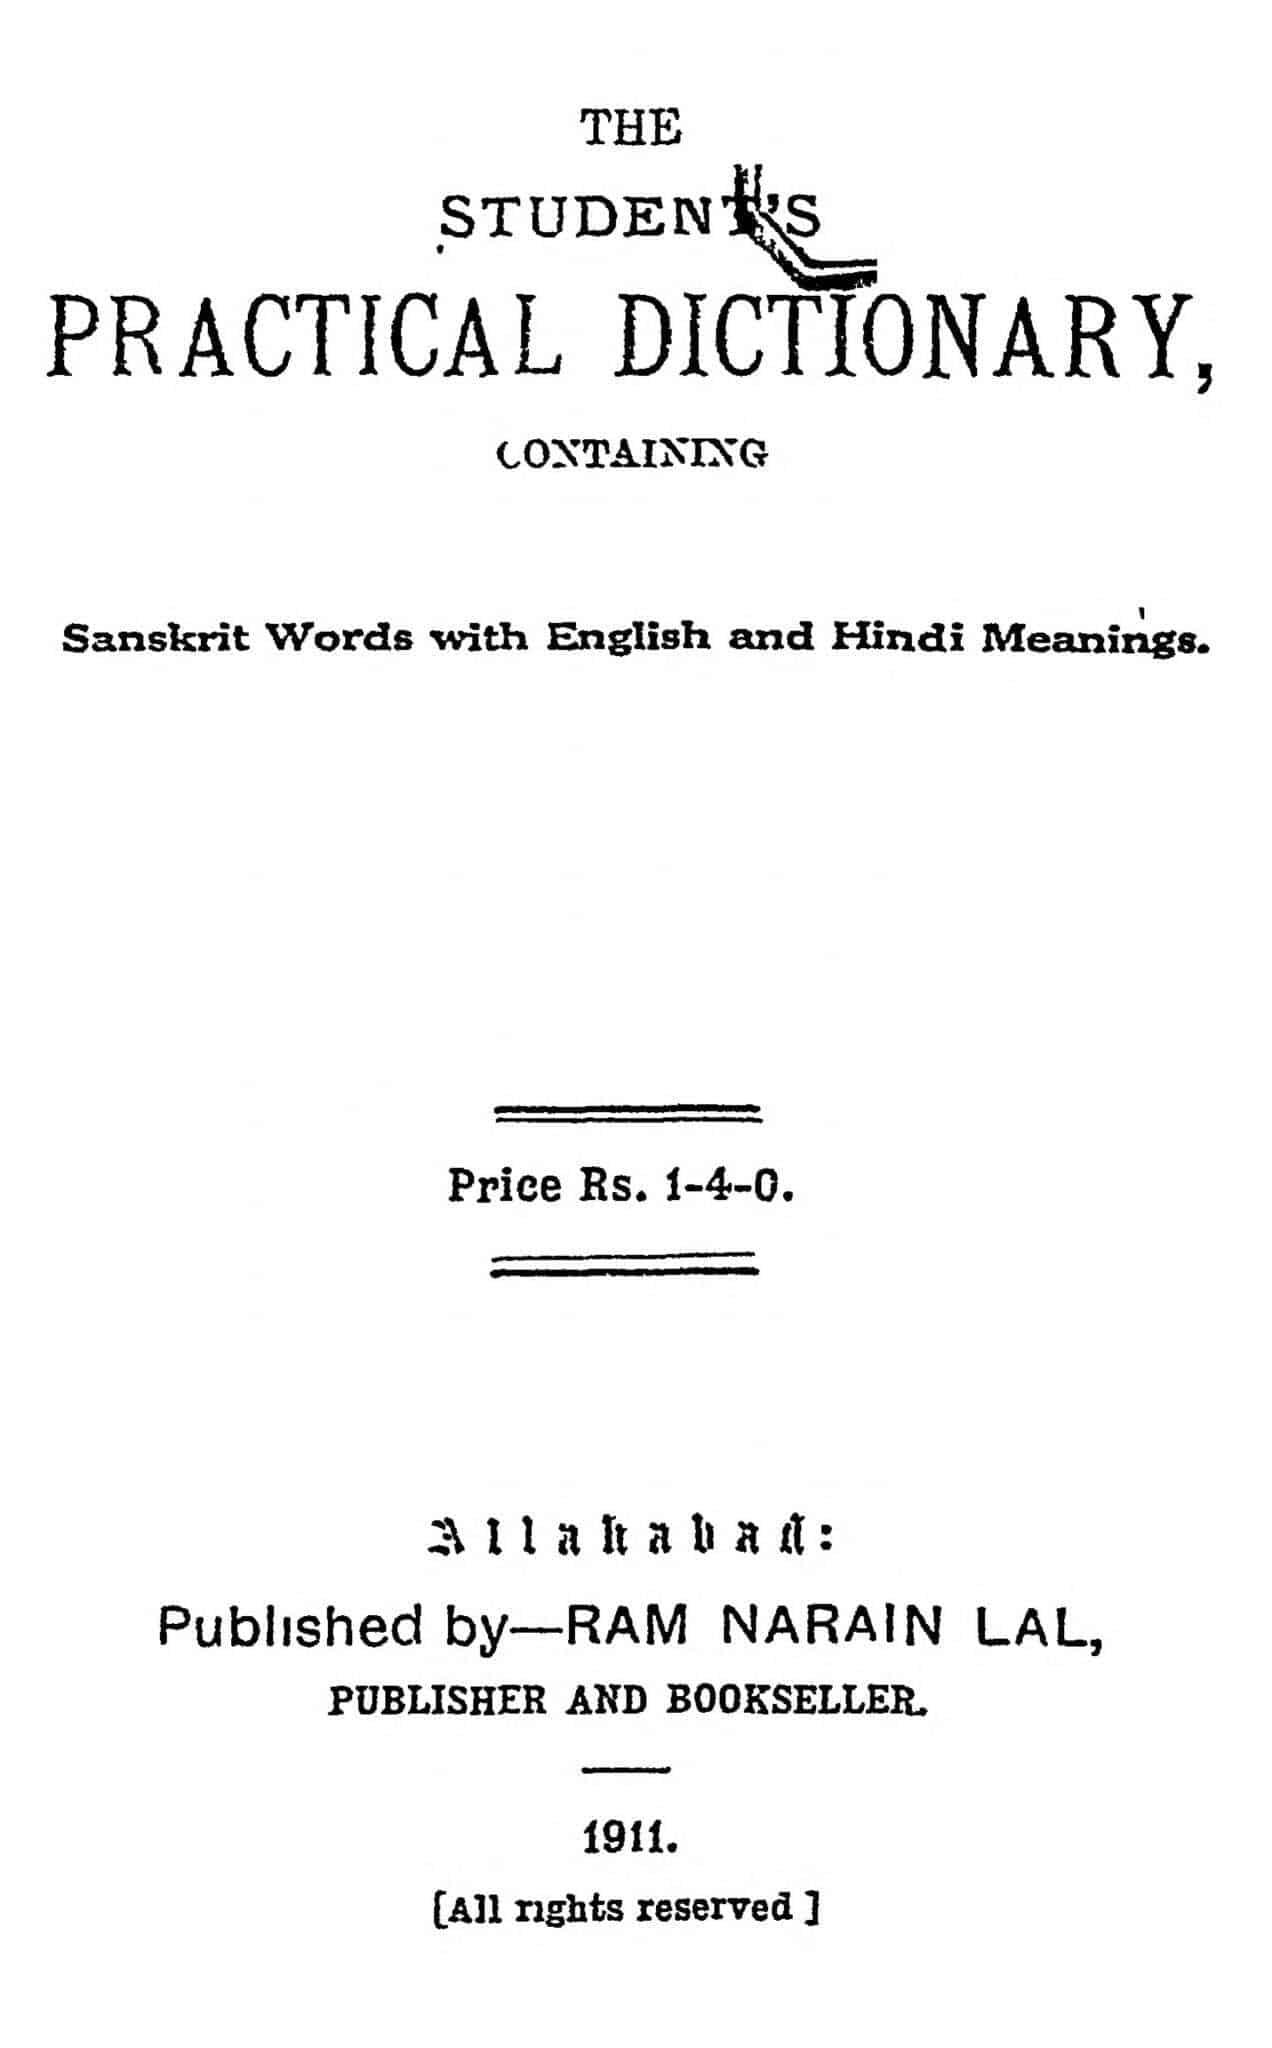 Book Image : संस्कृत हिंदी शब्दकोष - The Students Sanskrit Hindi Dictionary